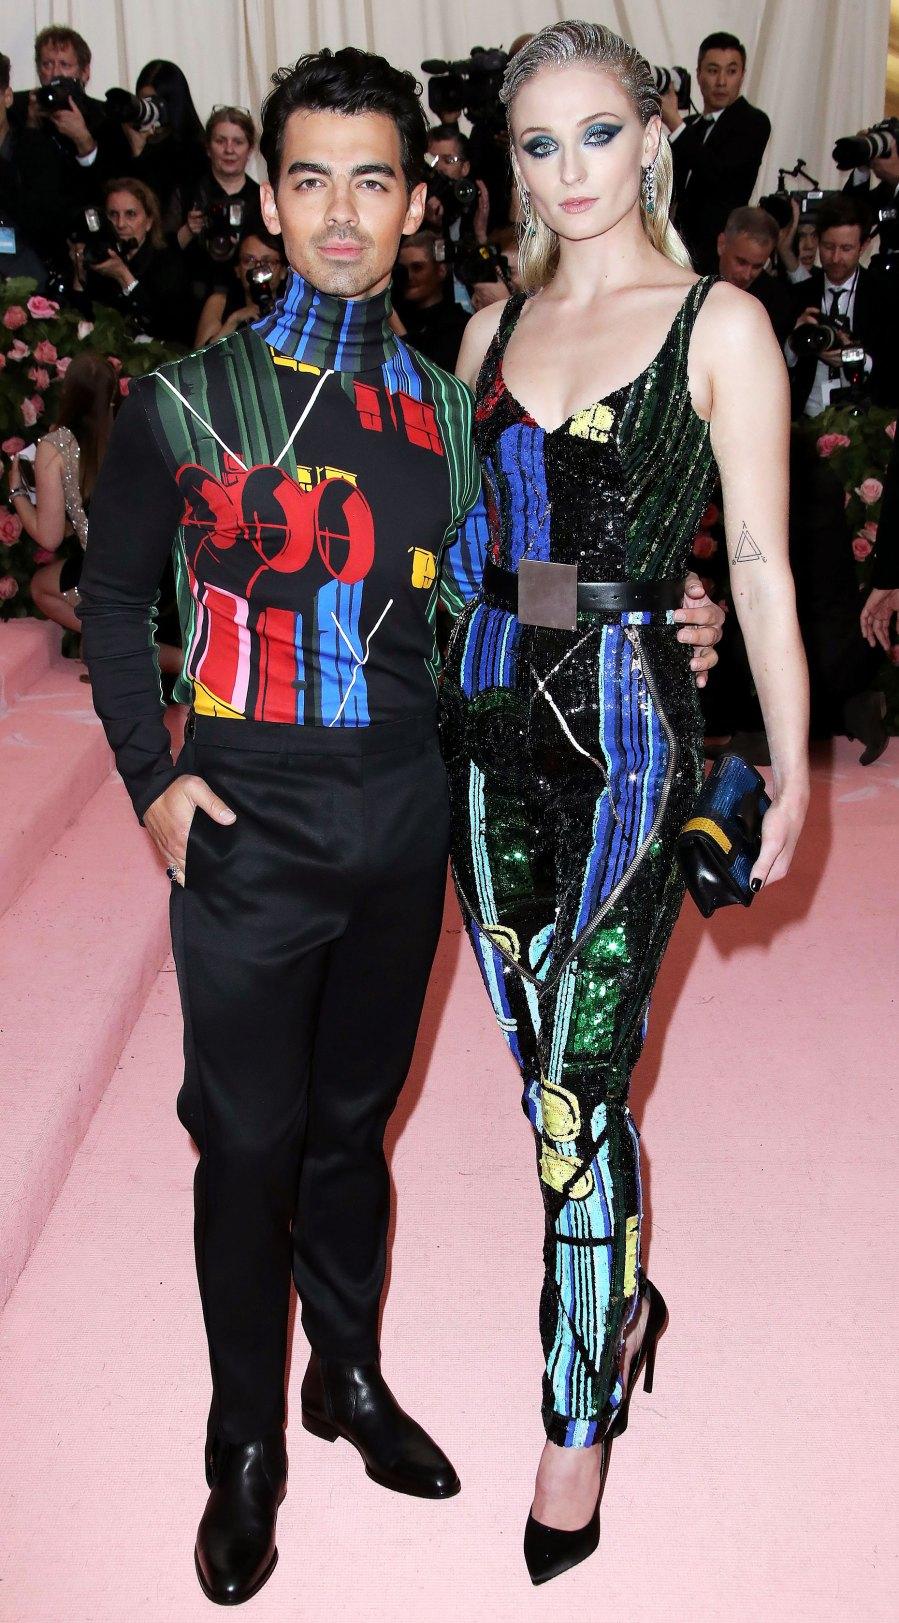 Sophie Turner Louis Vuitton May 6, 2019